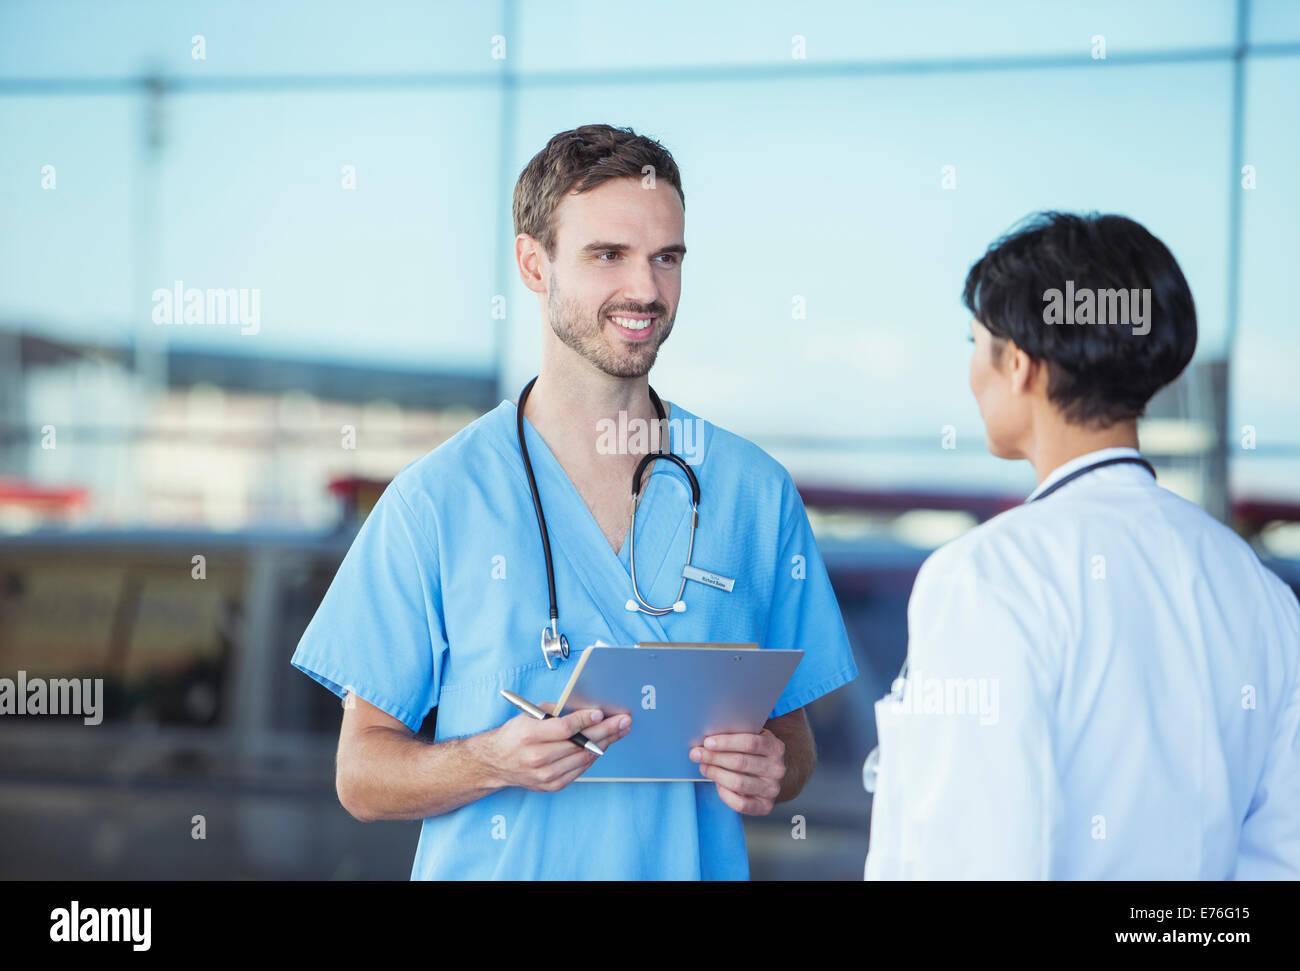 Doctor and nurse talking outside hospital - Stock Image